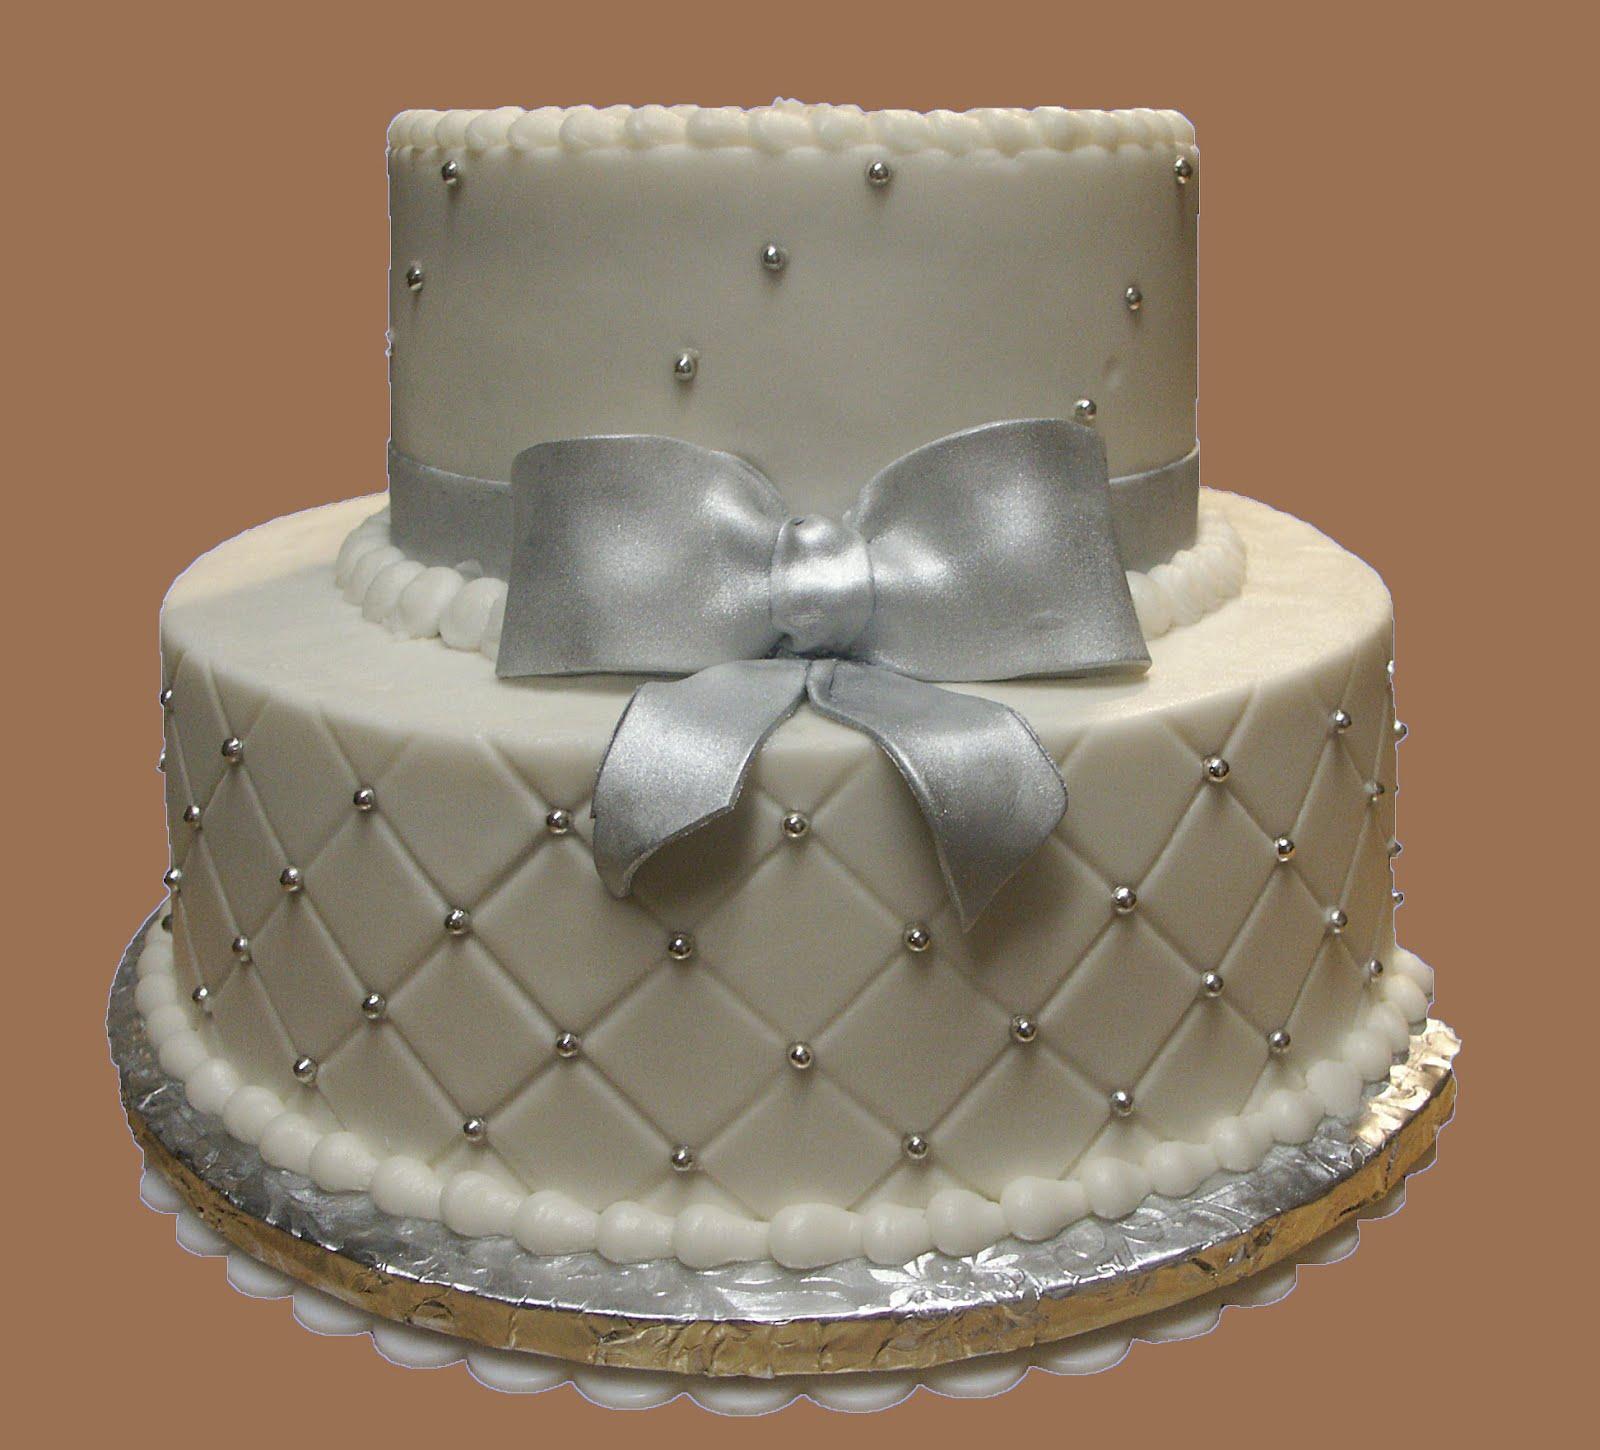 25th Wedding Anniversary Decoration Ideas: Cakes And Cakes: 25TH Wedding Anniversary *Buttercream And